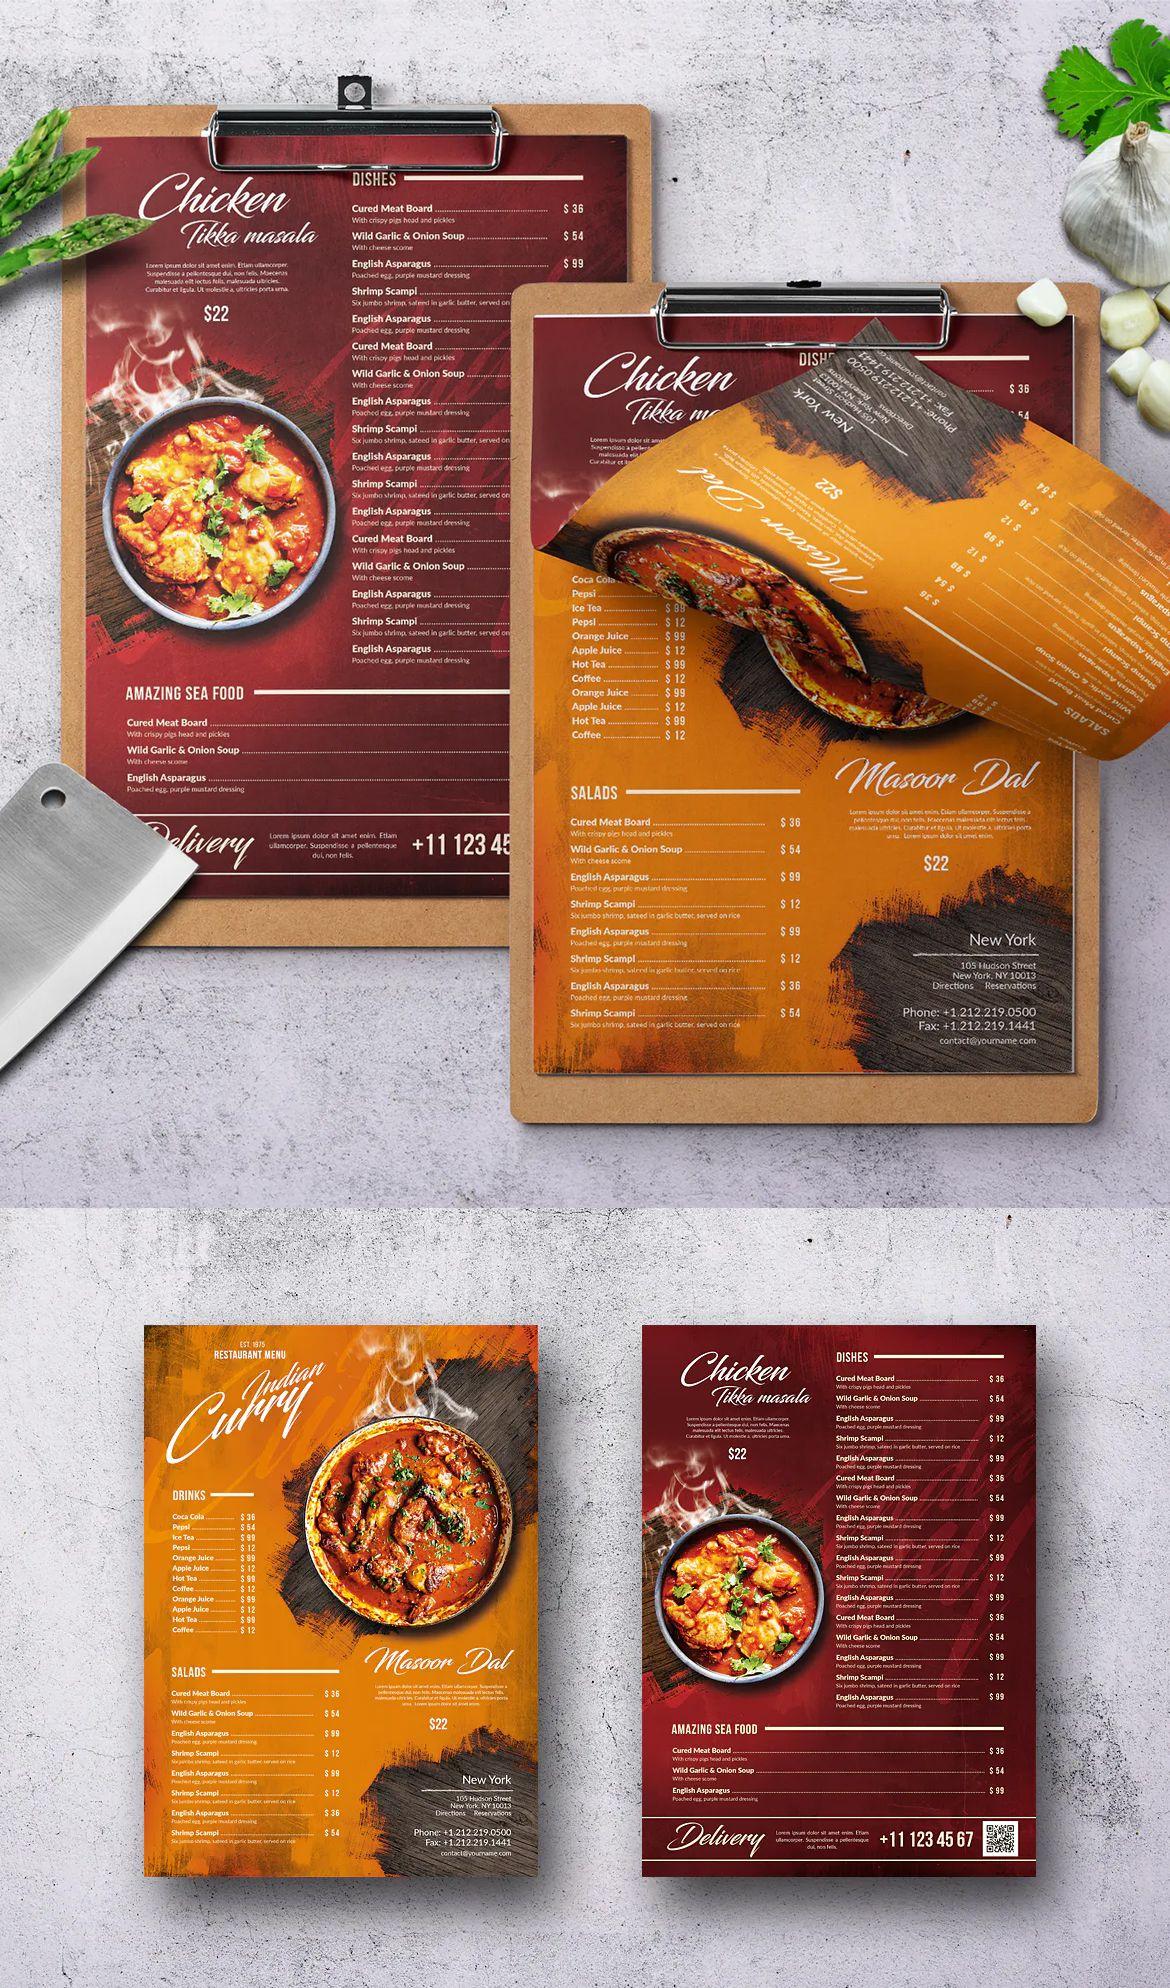 Curry indian food menu design in 2020 indian food menu